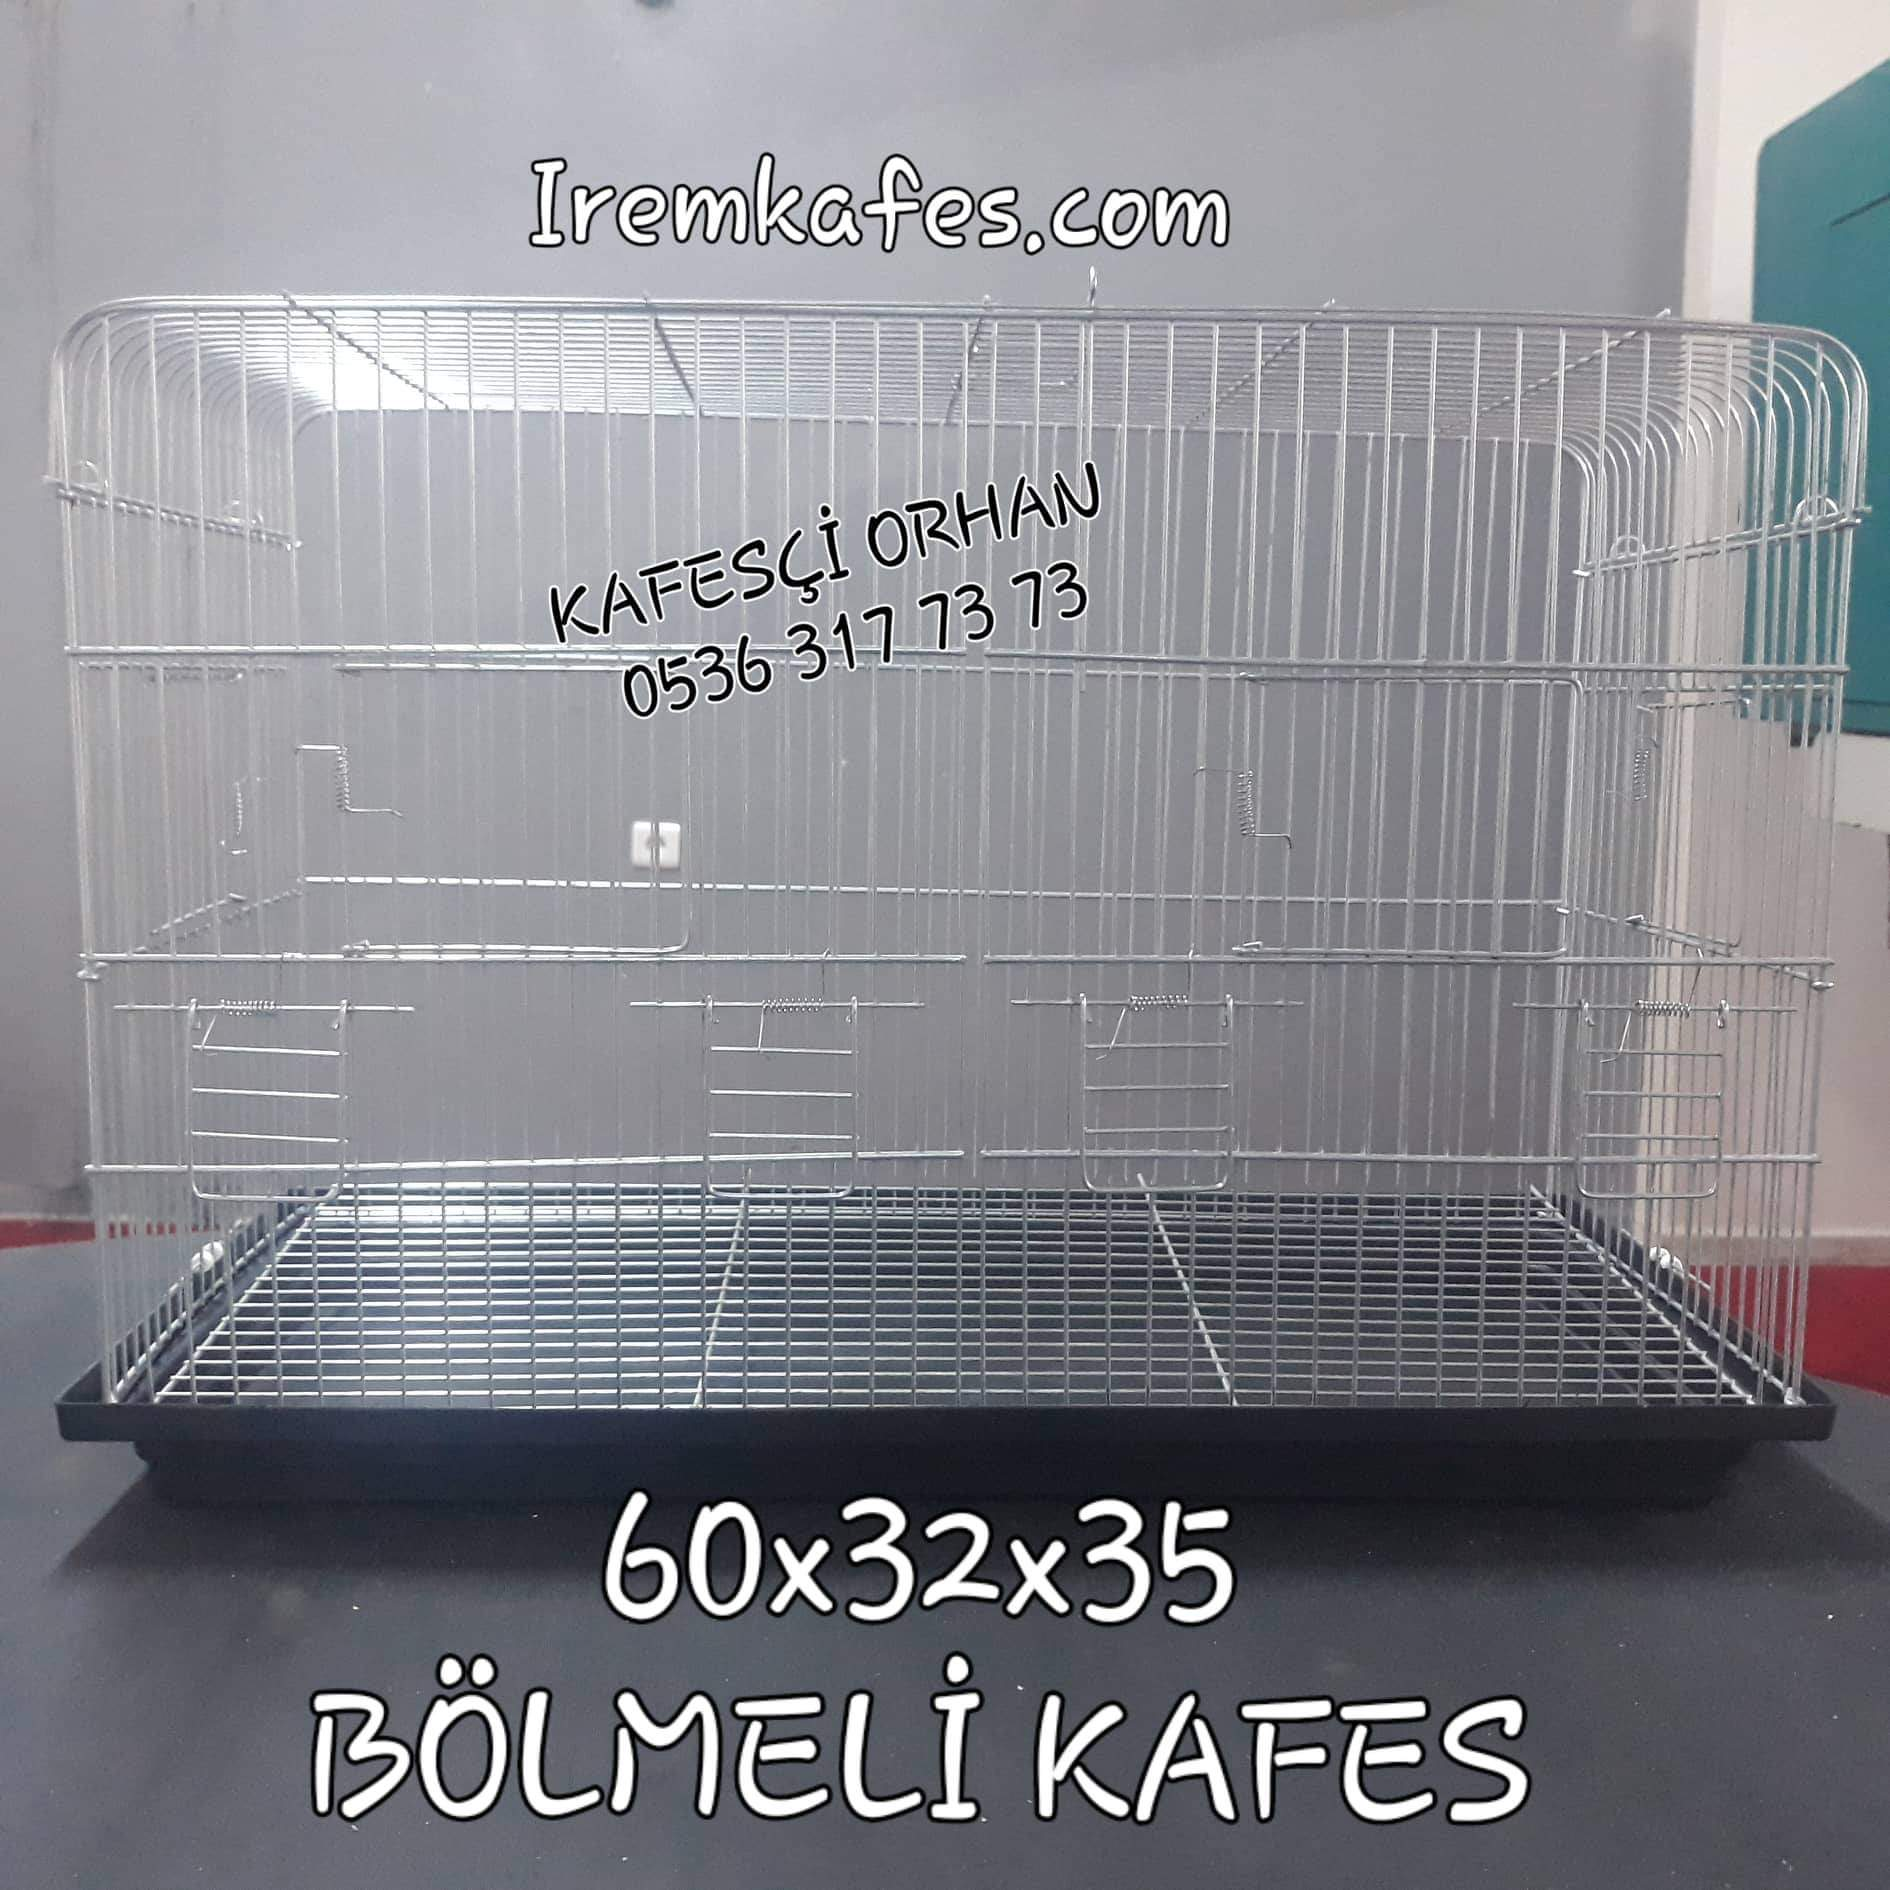 received_2079050022216507.jpeg